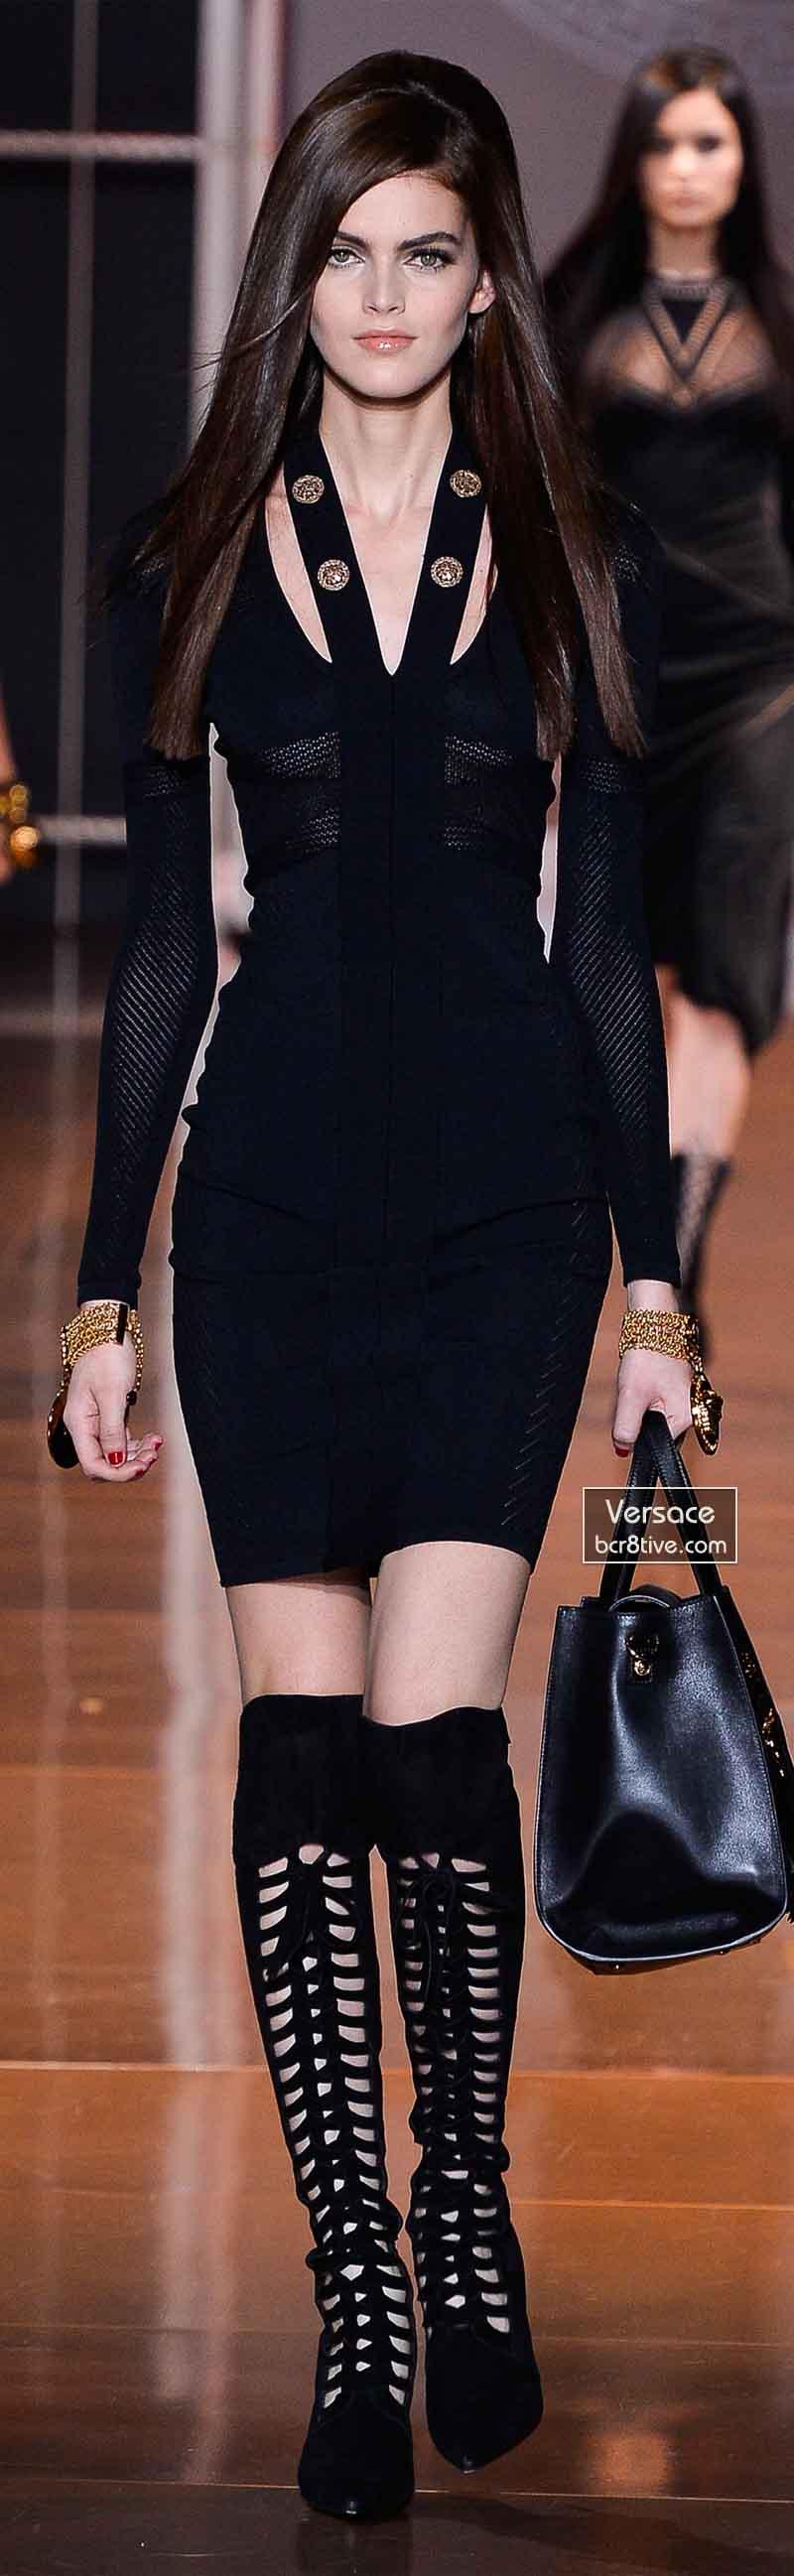 Versace Fall 2014 - Kamila Hansen